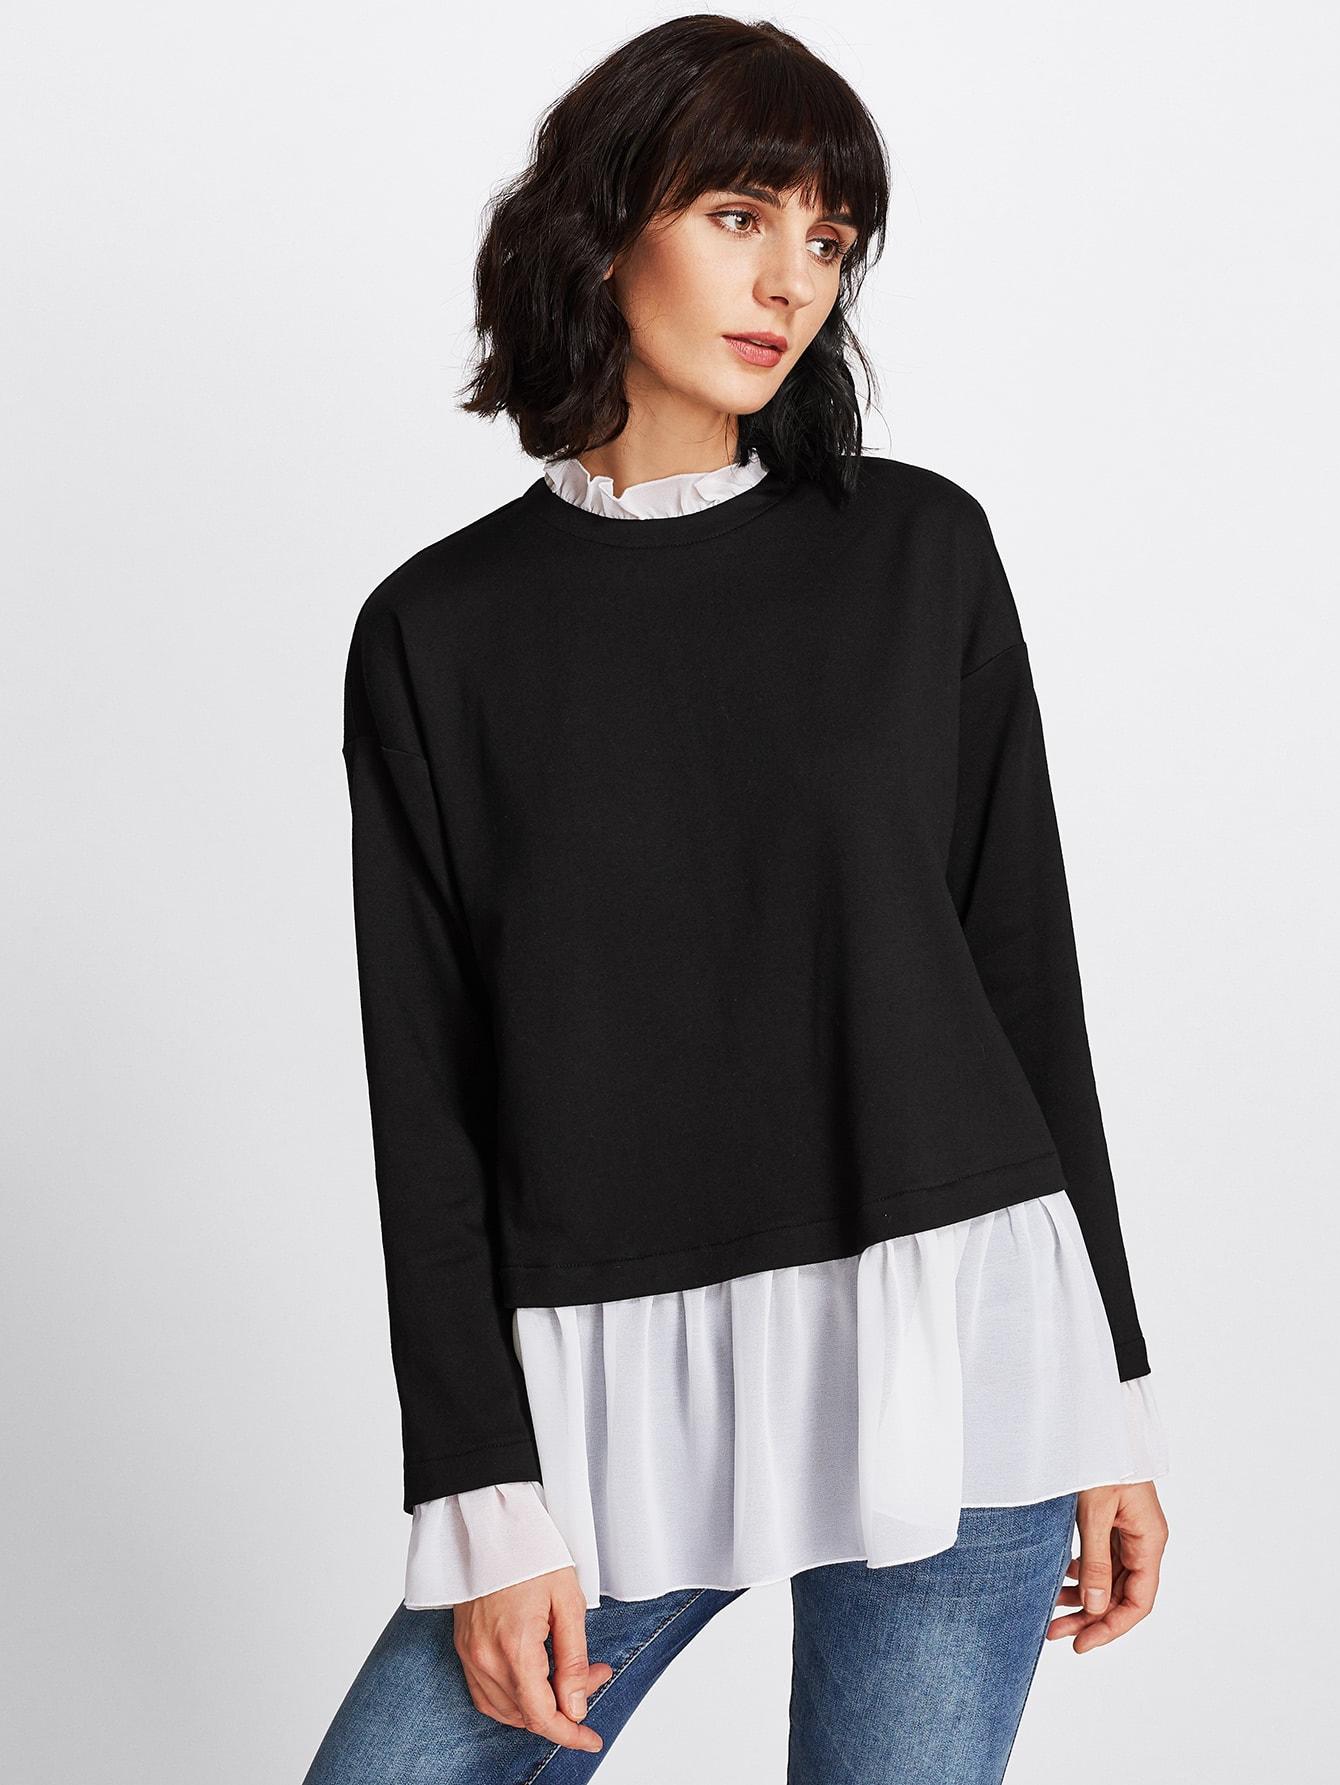 Contrast Ruffle Trim Heather Knit Sweatshirt mesh trim heather knit tee